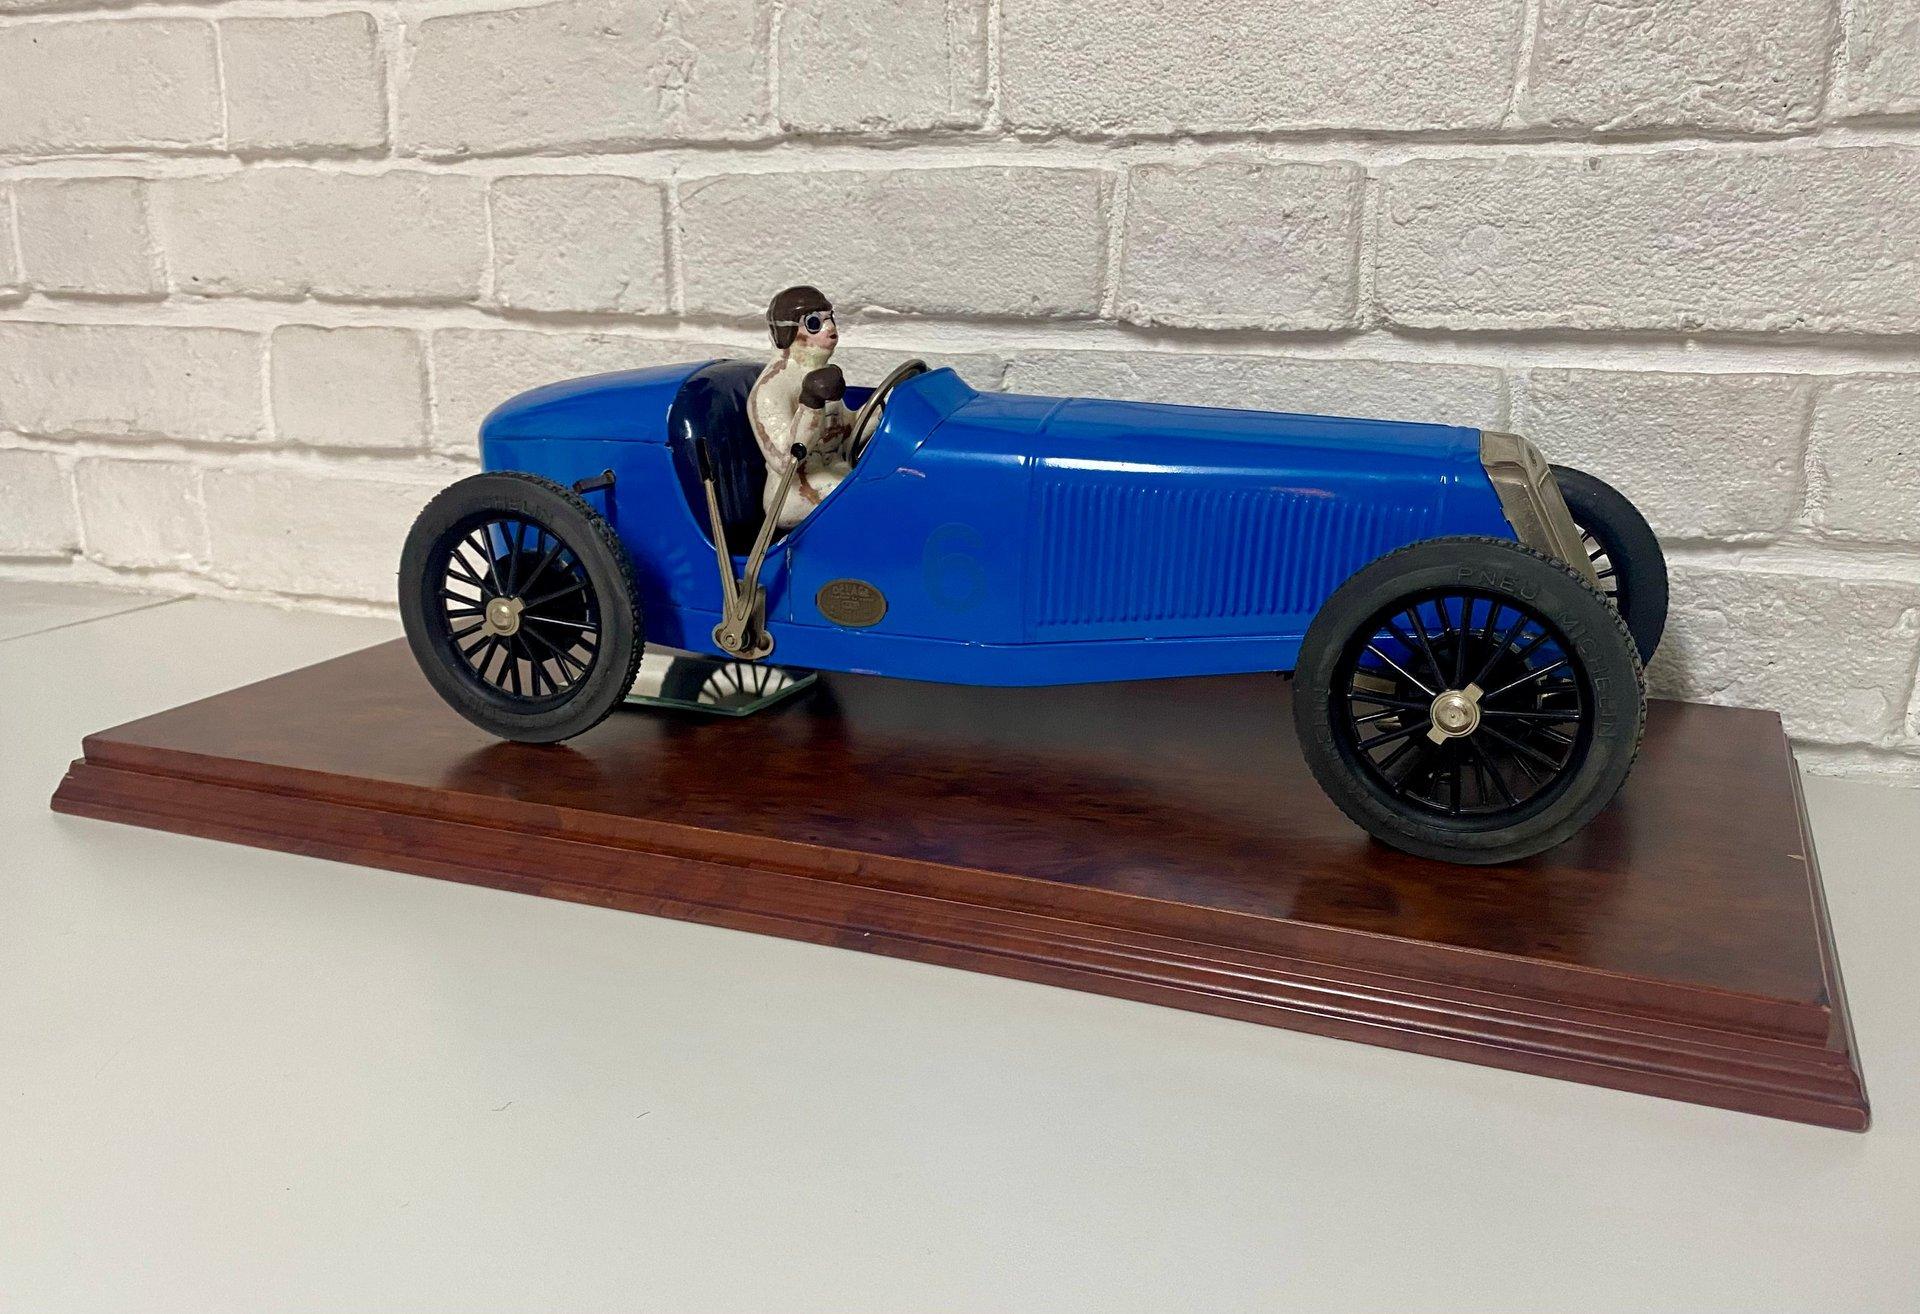 1927 delage 15 s8 model car